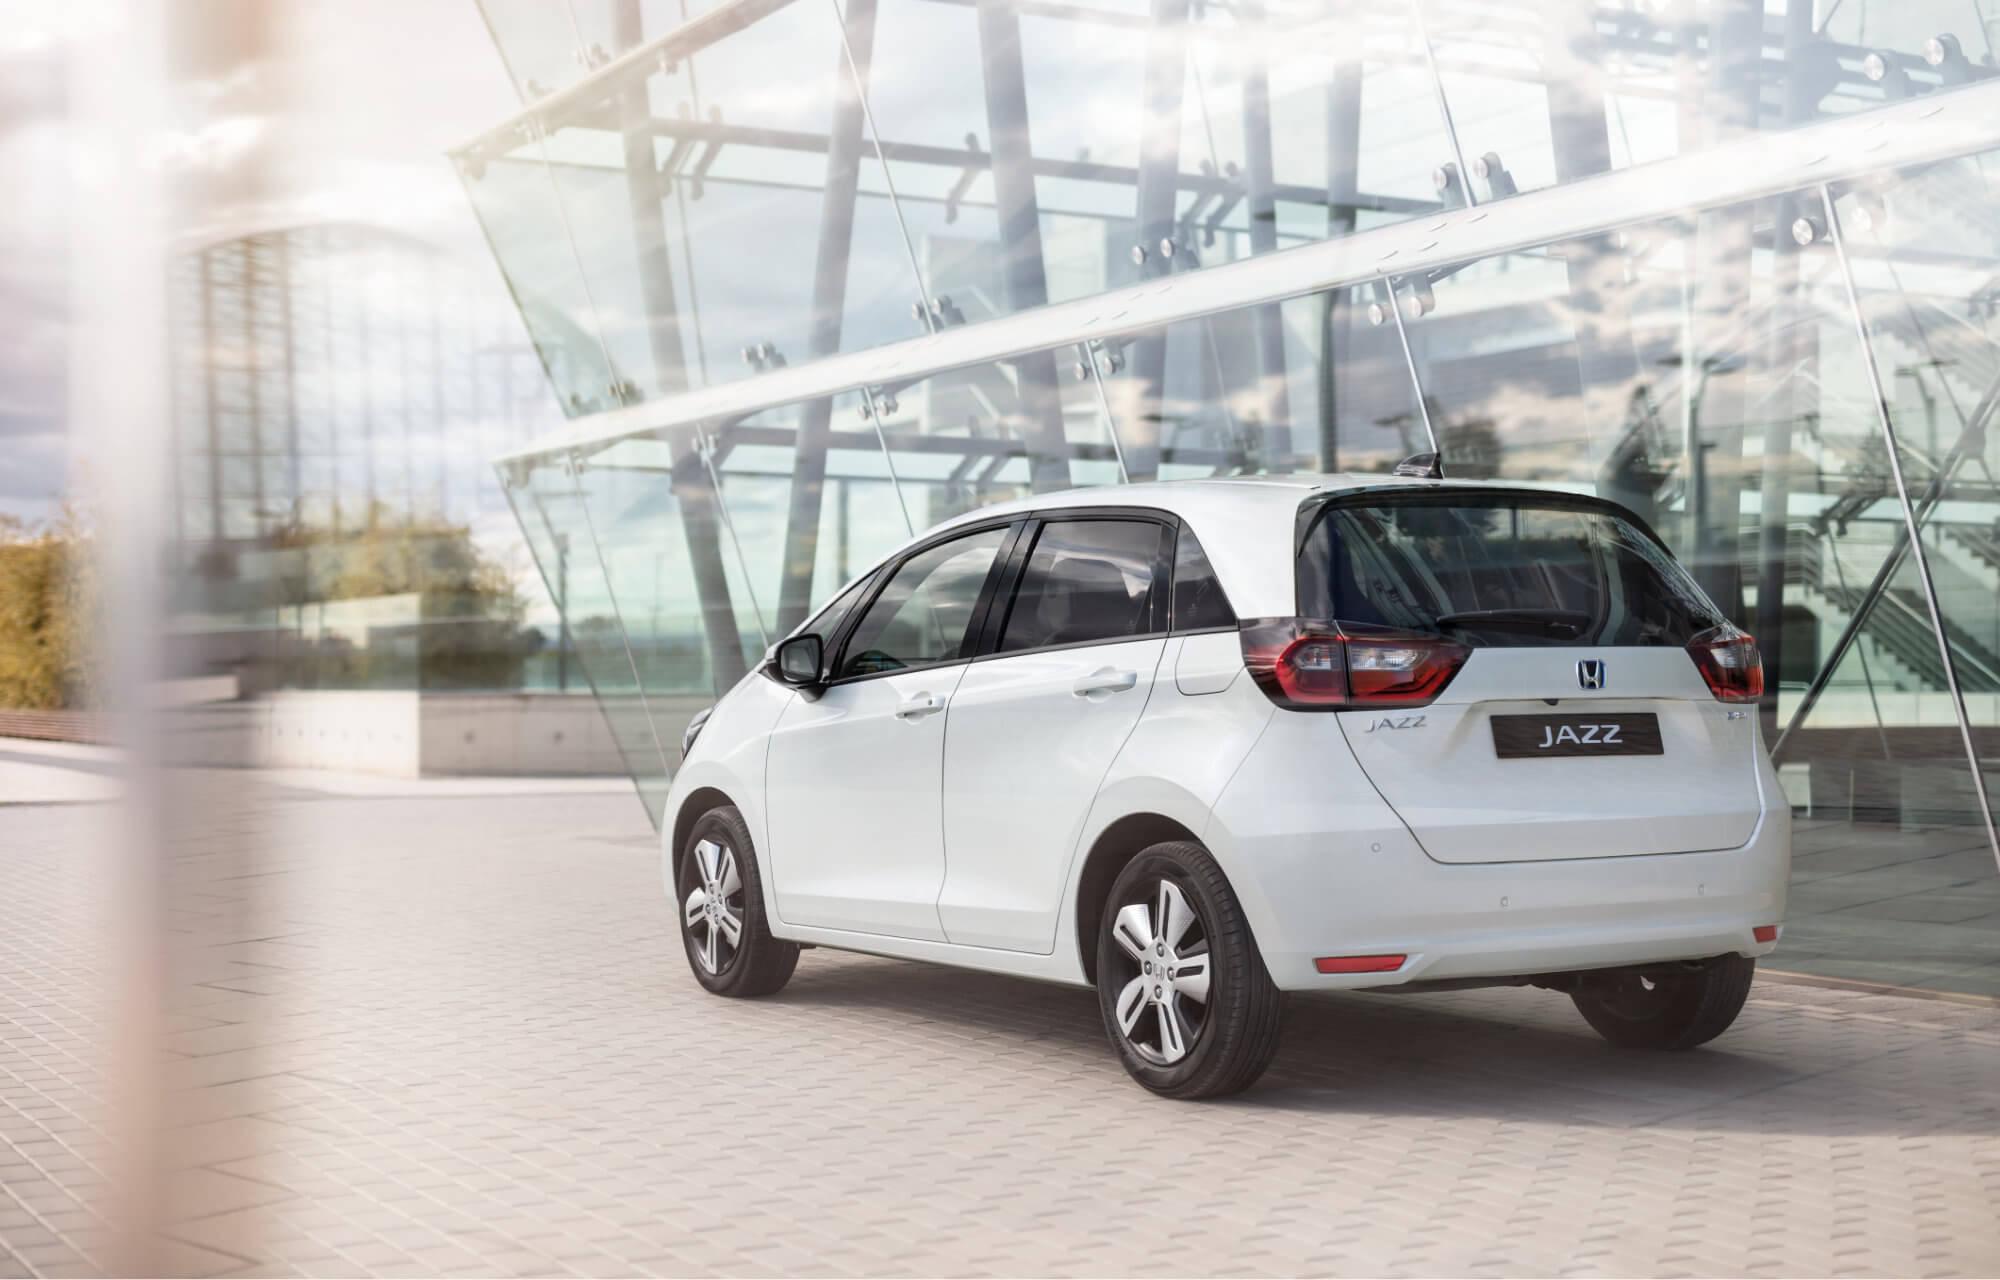 All-New Jazz Hybrid wins Reddot Car Design Award 2021